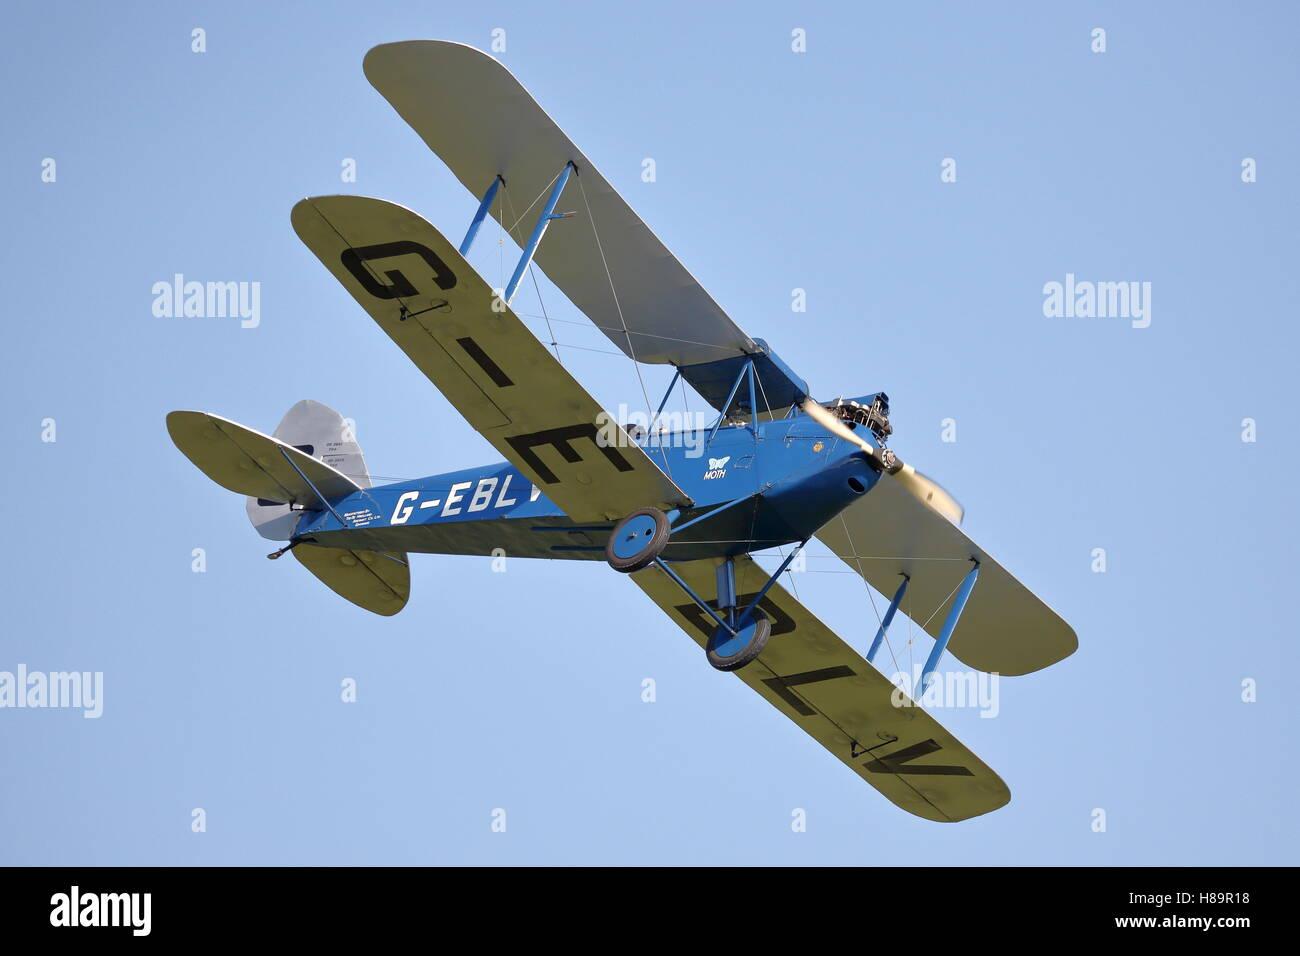 shuttleworth-collections-de-havilland-dh60-cirrus-moth-g-eblv-at-an-H89R18.jpg